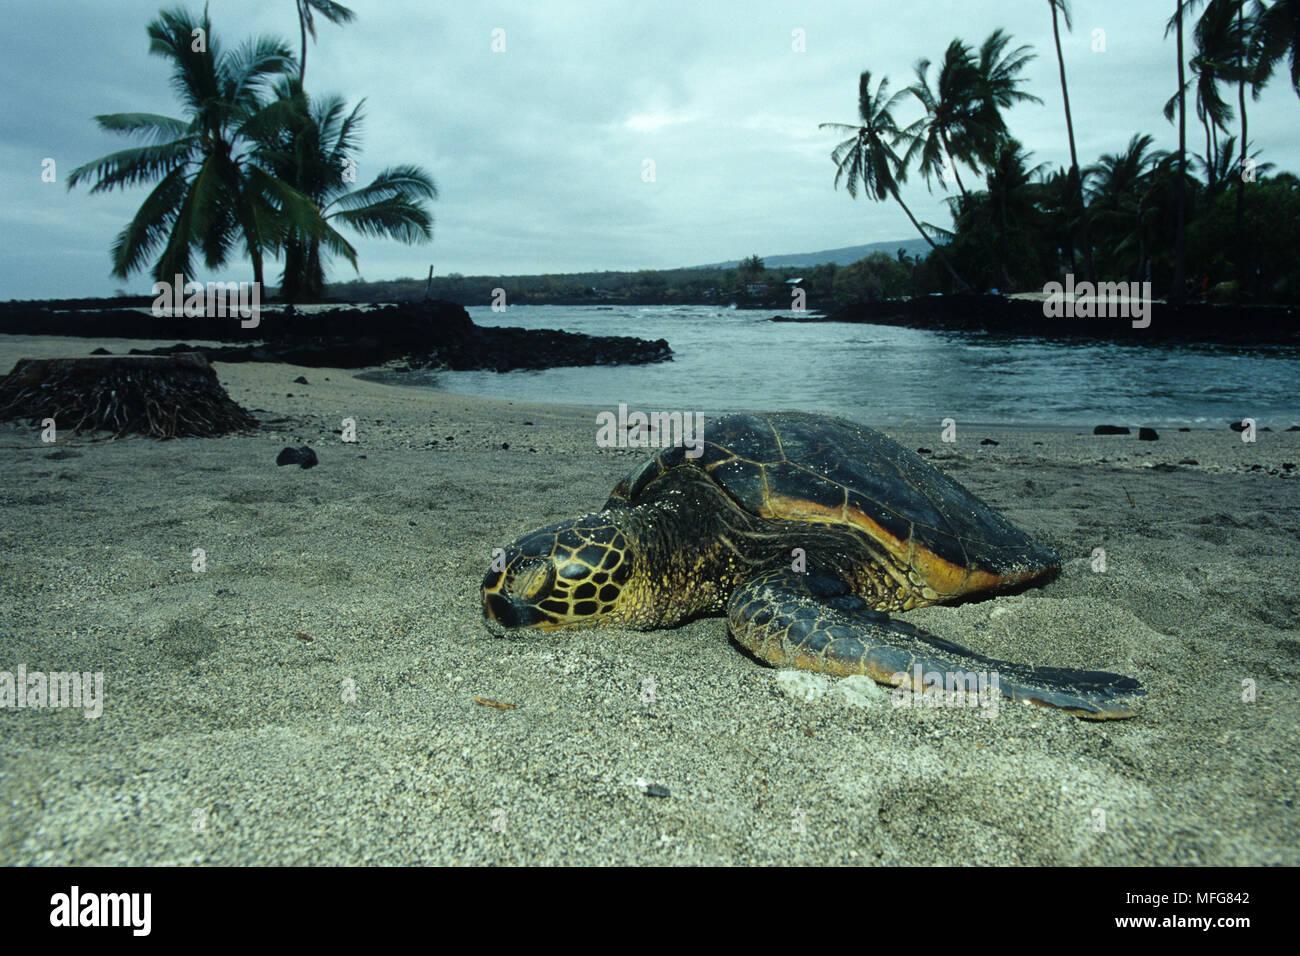 Green sea turtle, Chelonia mydas, endangered (IUCN), sleeping, Place of Refuge, Pu'uhonua or Honaunau, Kona, Big Island, Hawaii, Pacific Ocean  Date:  - Stock Image